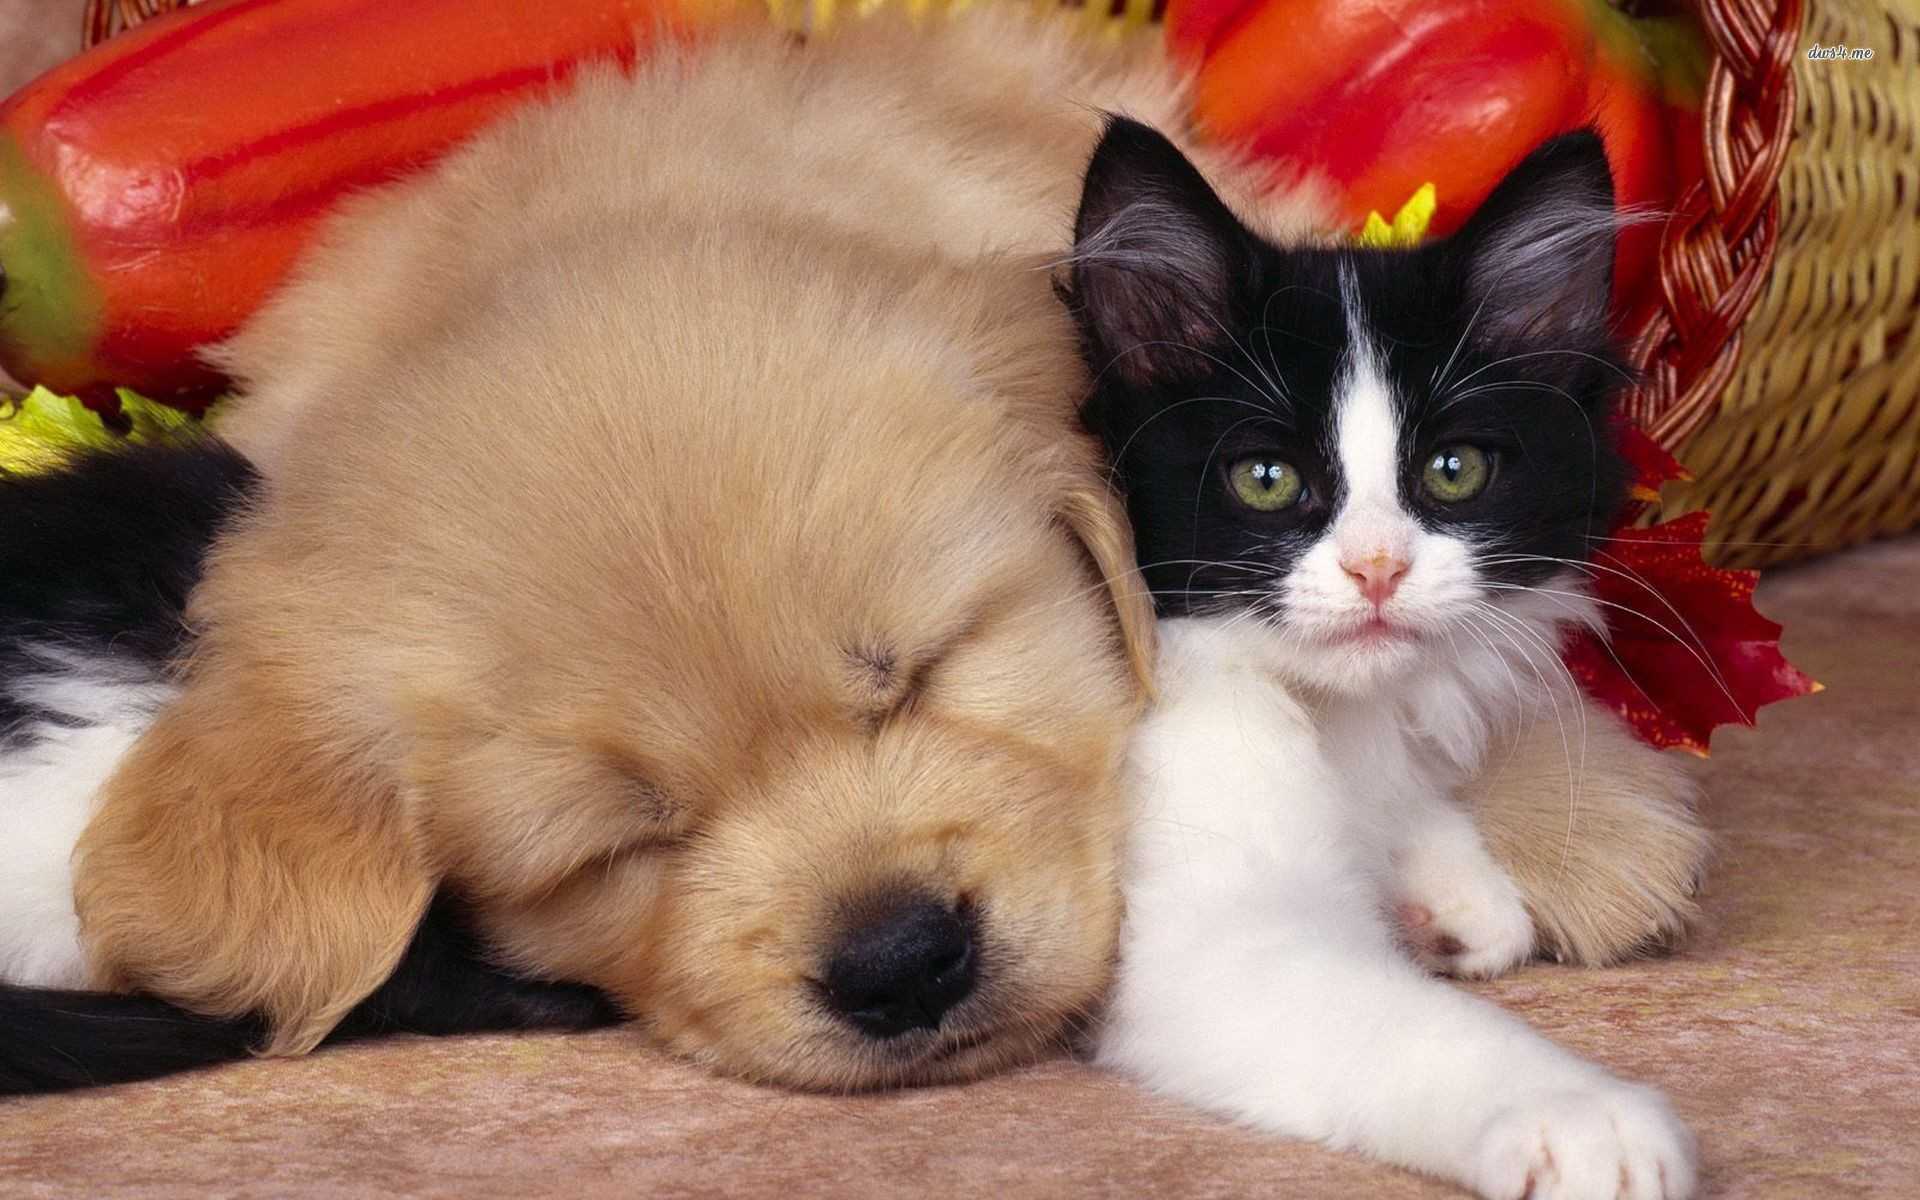 Cute Dog And Cat Wallpapers Cute Dog Cat hd Wallpaper